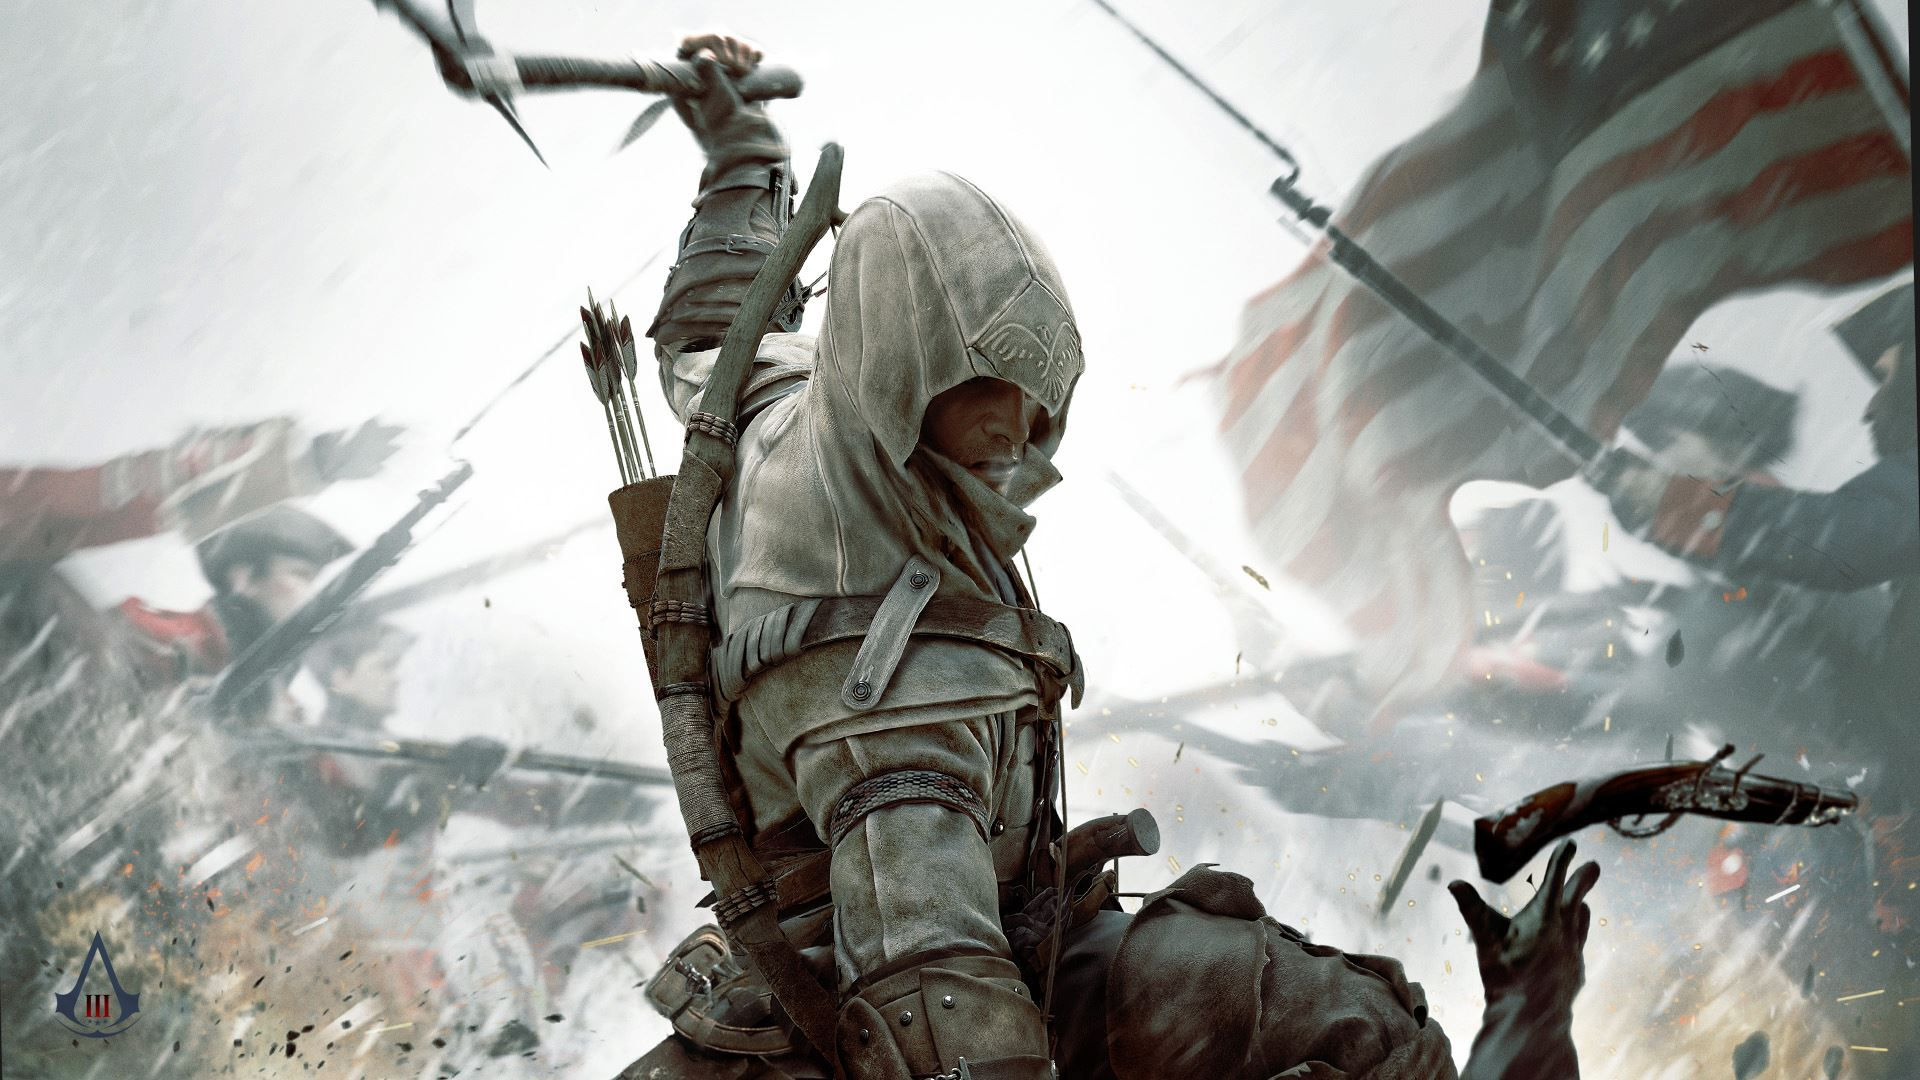 Assassins Creed Assassins creed, Assassins creed 3